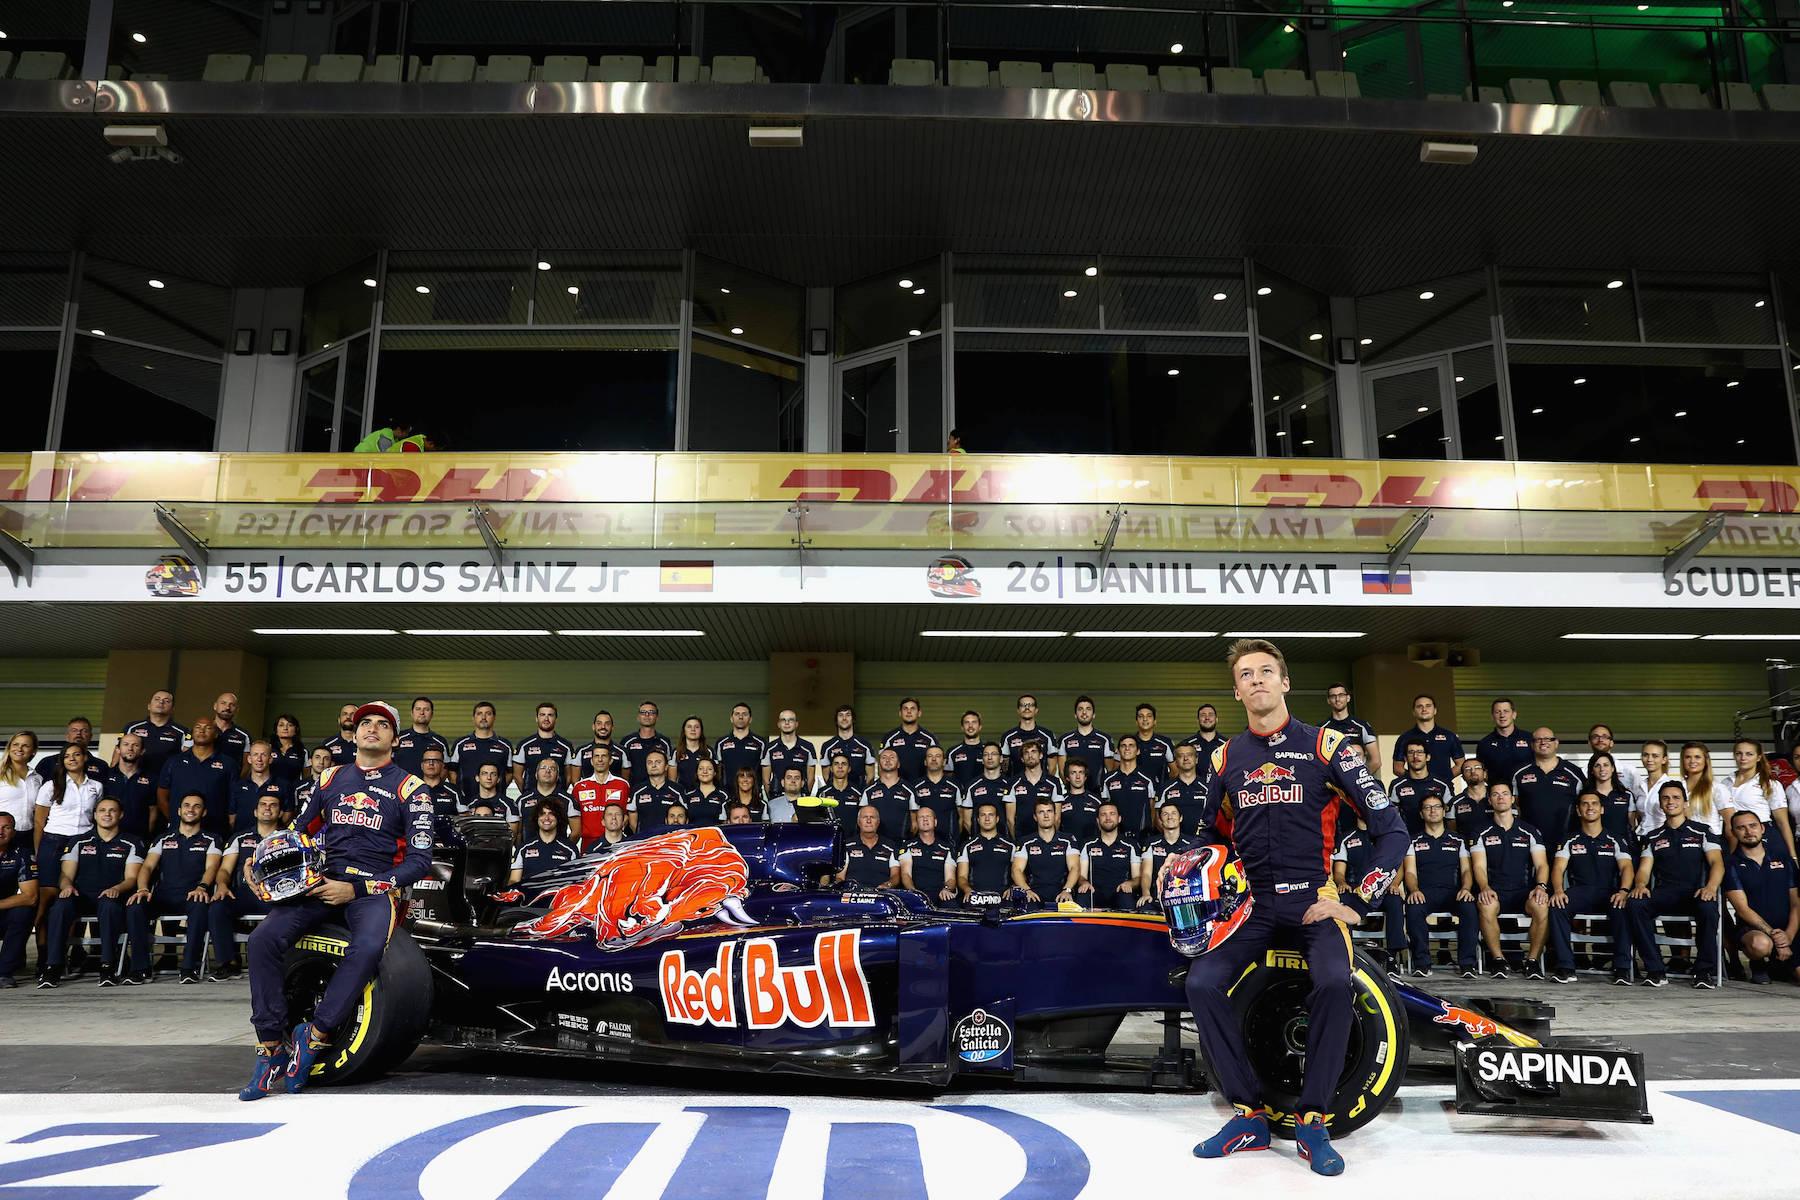 Salracing - Scuderia Toro Rosso family photo